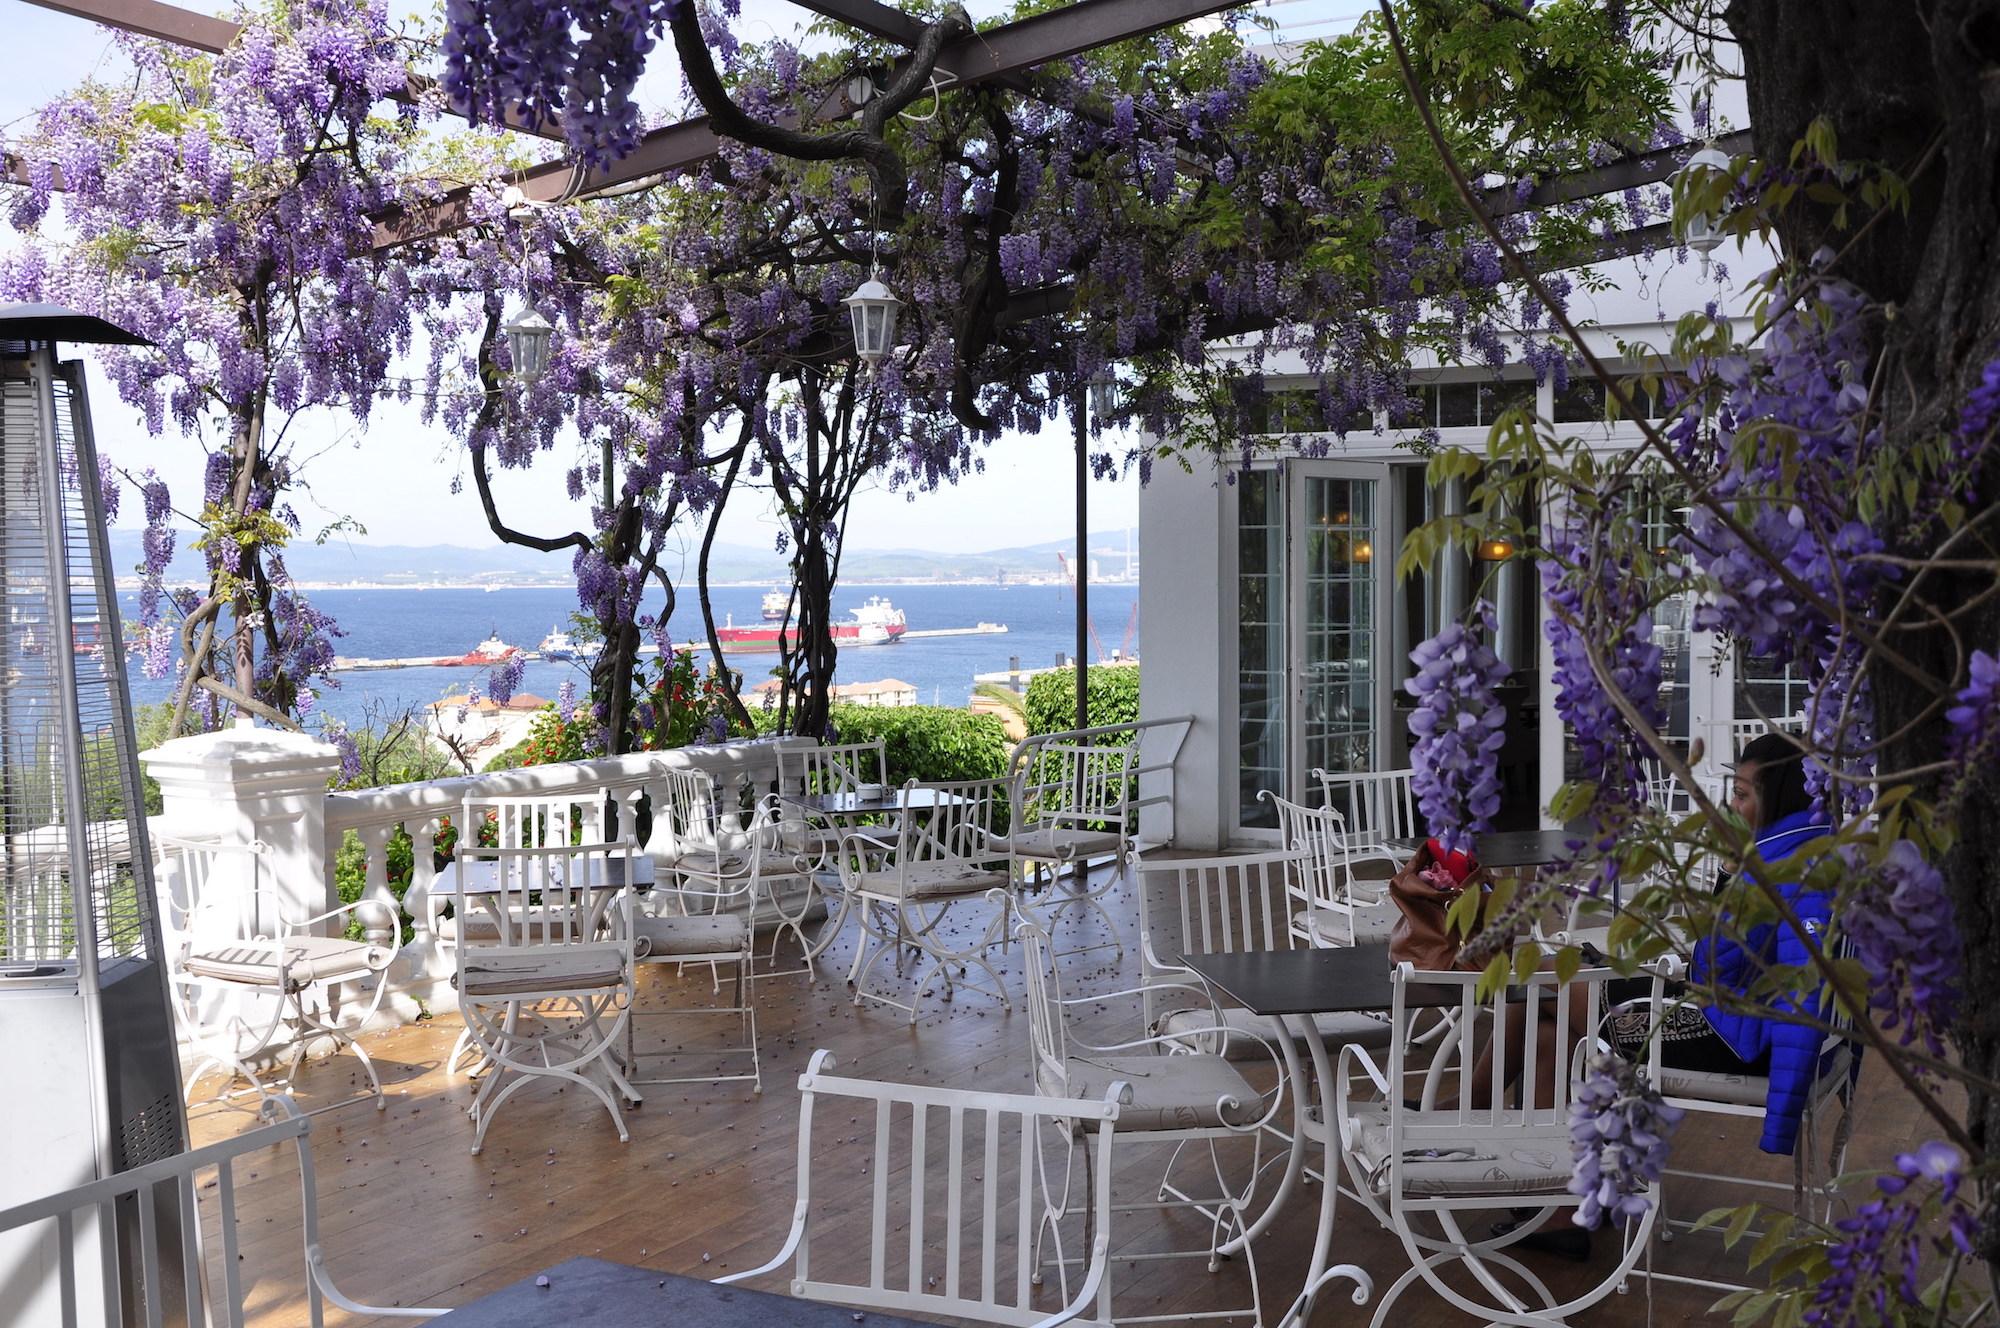 Wisteria Terrace, Rock Hotel, Gibraltar